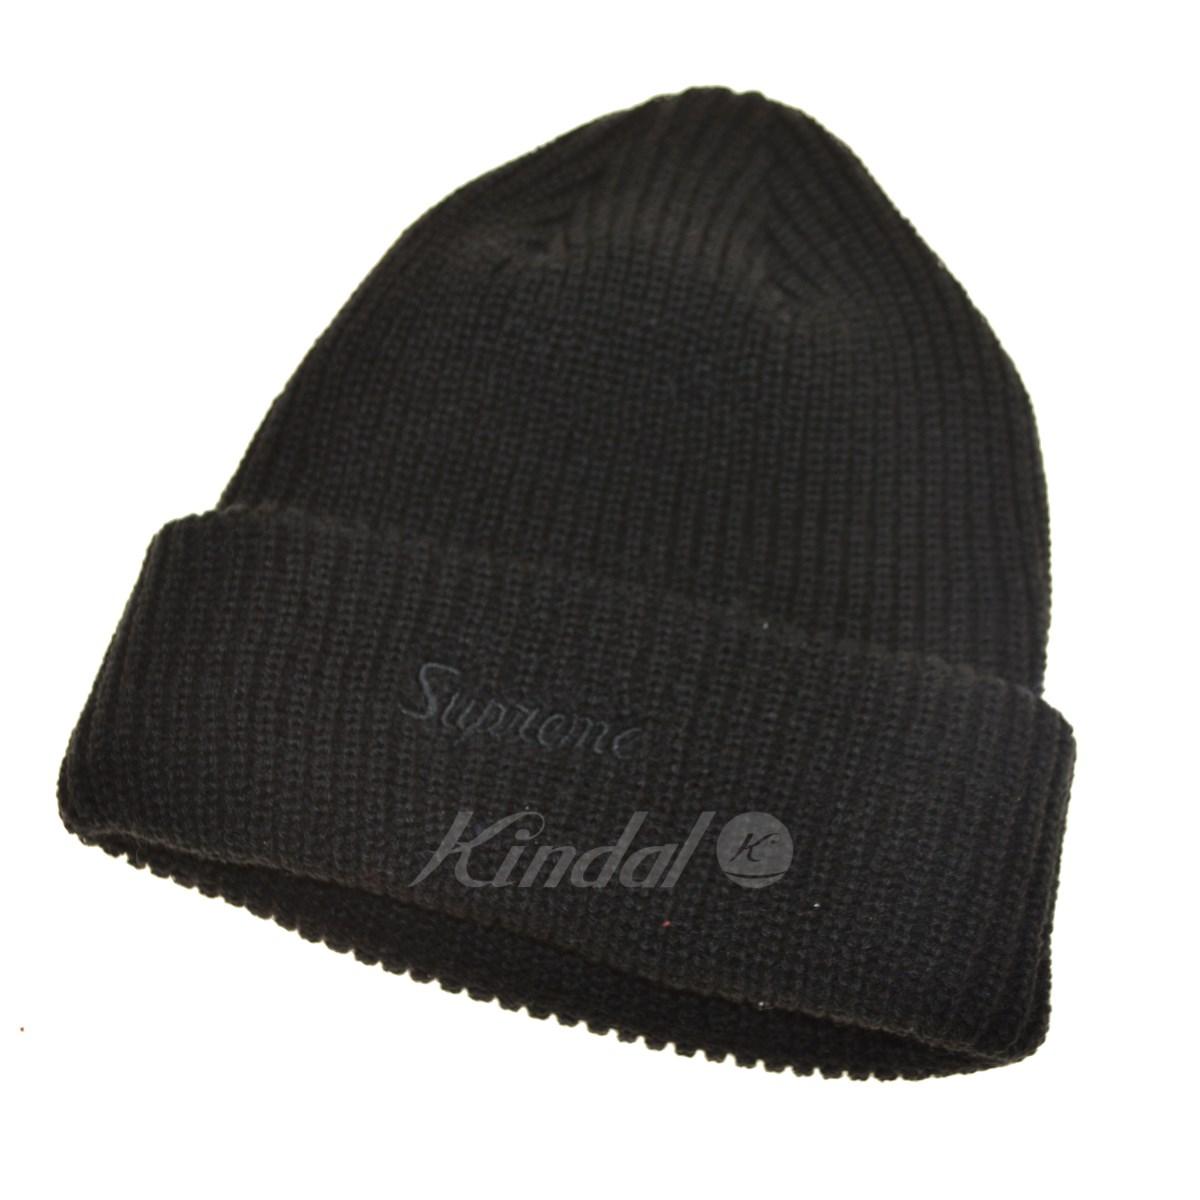 834abfd6a71 ... uk supreme loose gauge beanie knit cap black size c85b6 e7094